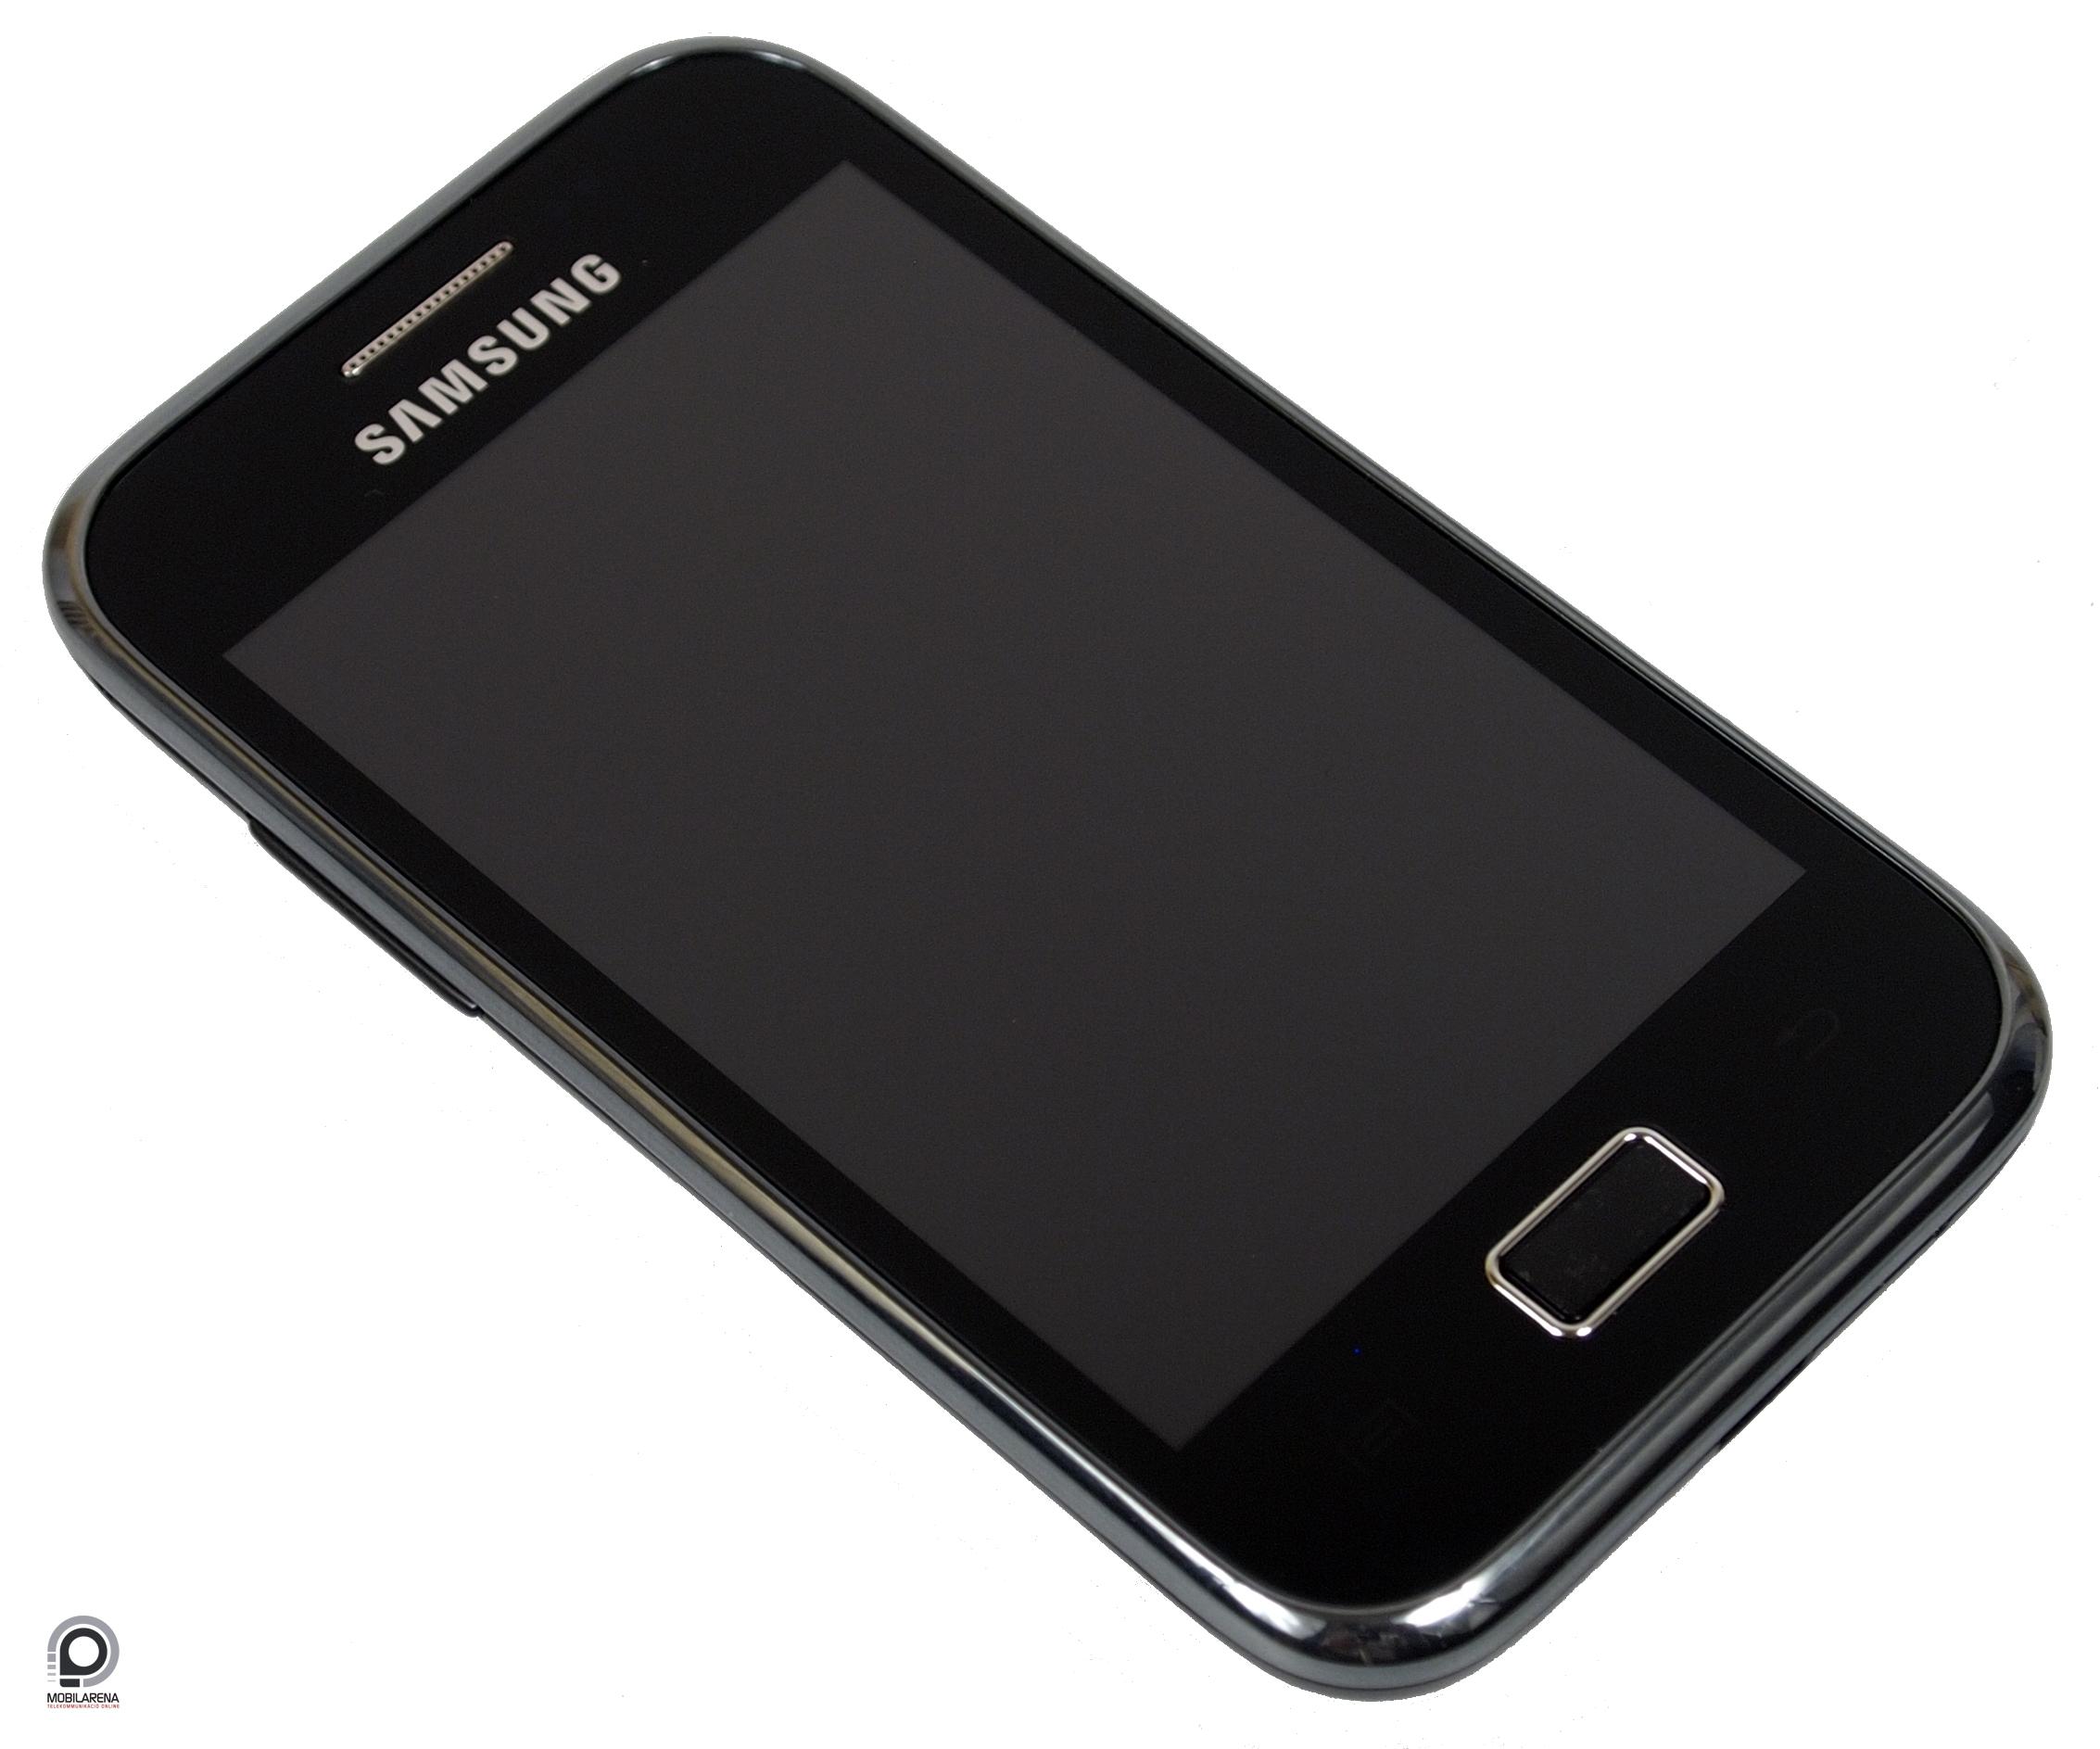 Harga samsung galaxy pro b7510 qwerty android